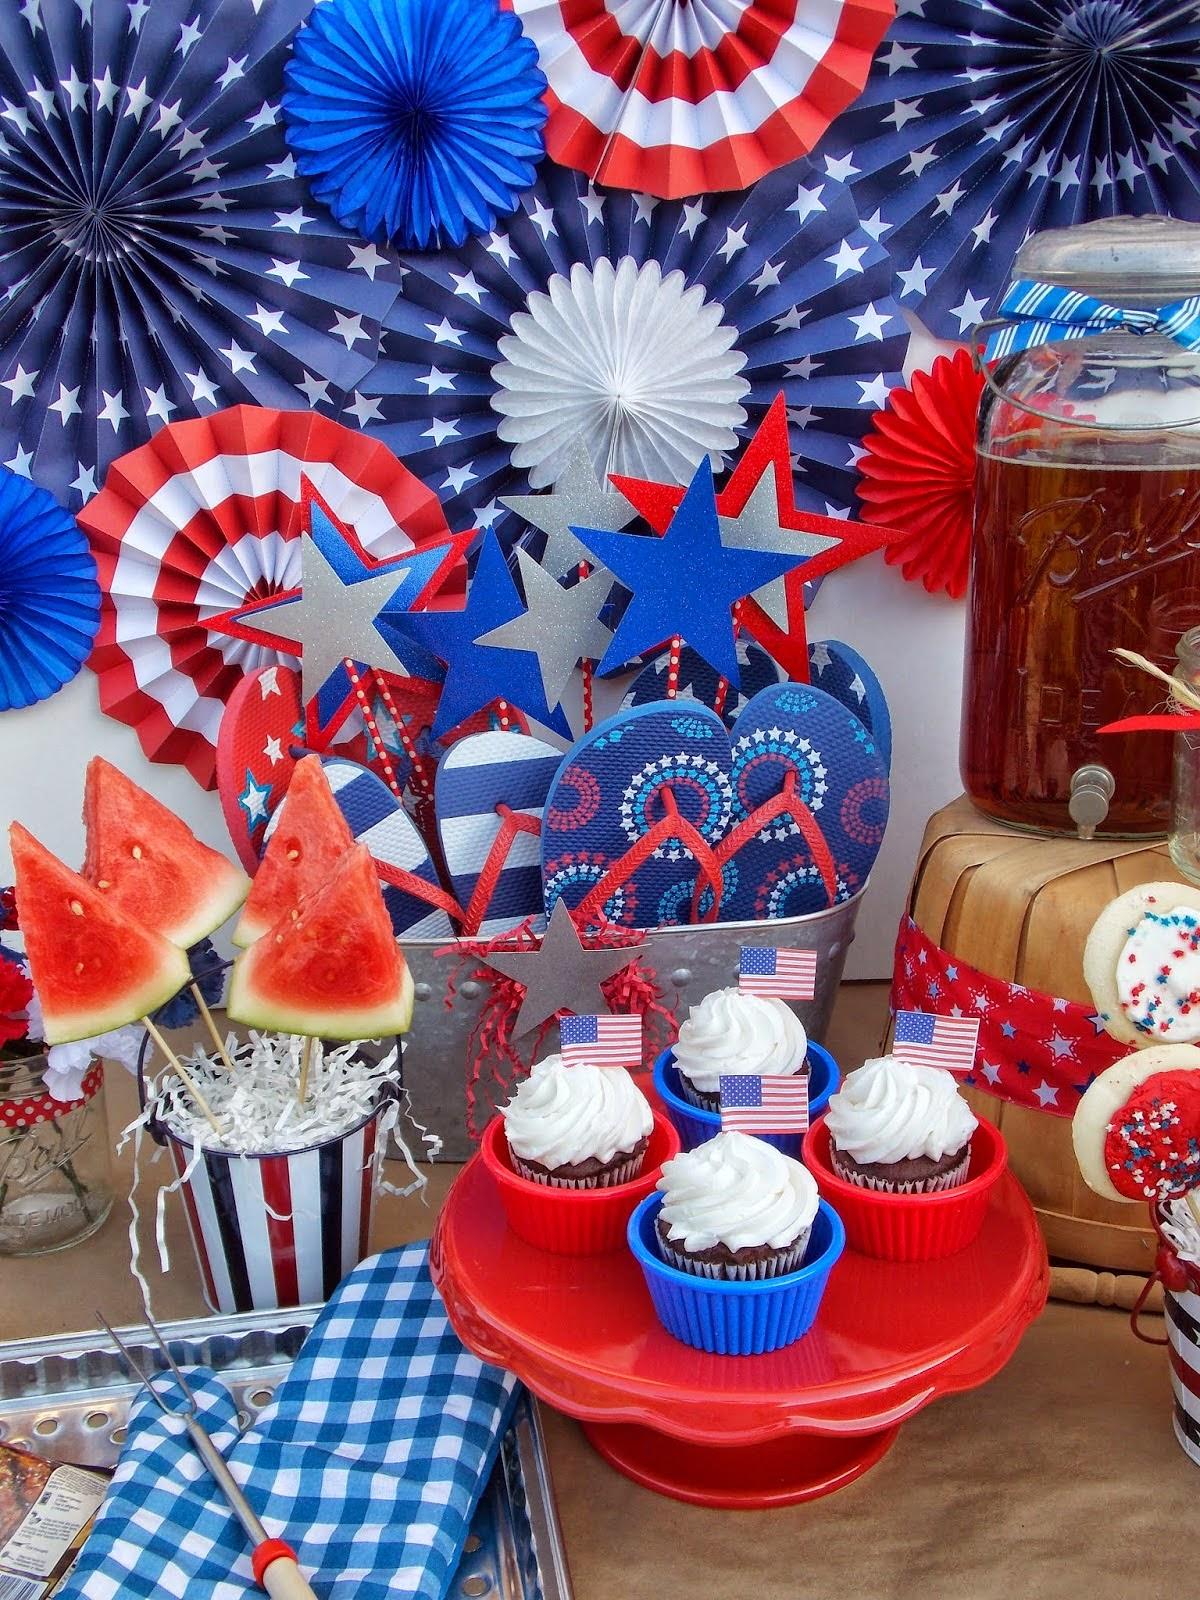 Cupcake Wishes & Birthday Dreams: {Friday Freebie} Patriotic Holiday on backyard barbecue decor ideas, backyard movie diy, backyard bbq food table decorating, backyard bbq wedding ideas, backyard barbeque pool party,